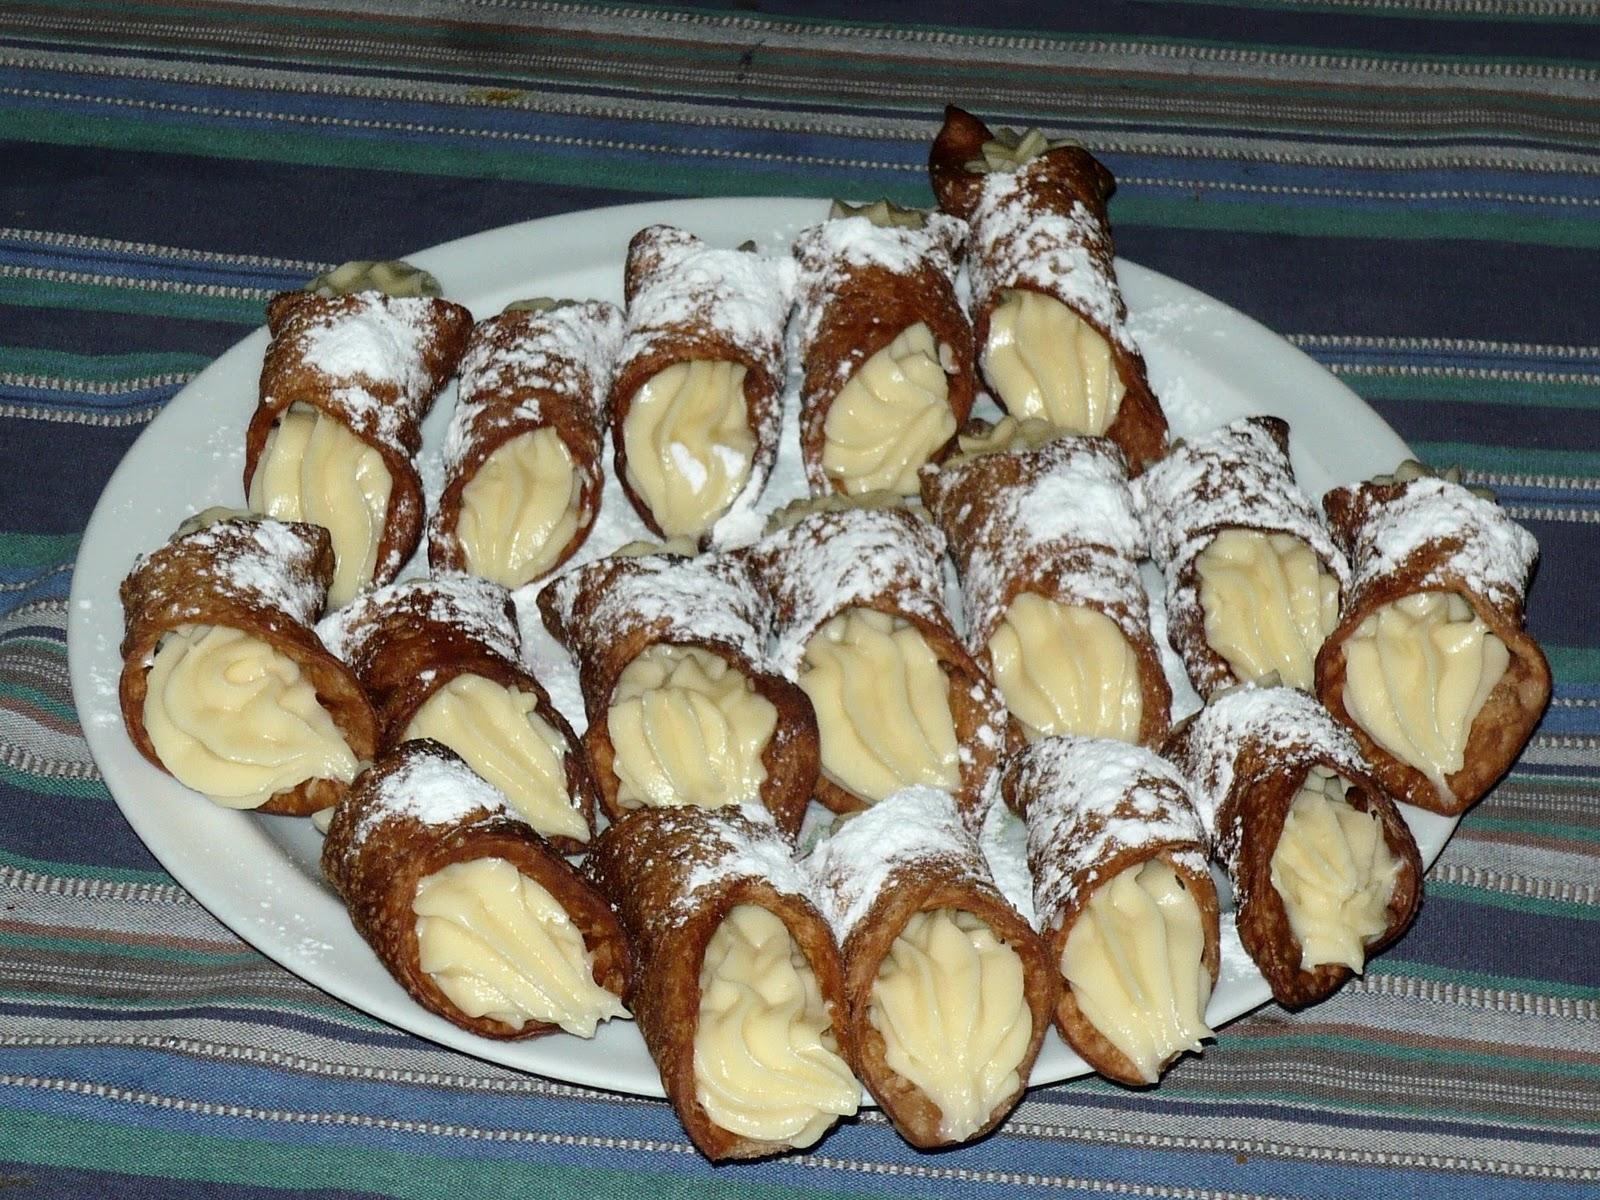 Pasticceria Hobby Cannoli Siciliani Sicilian Cannoli